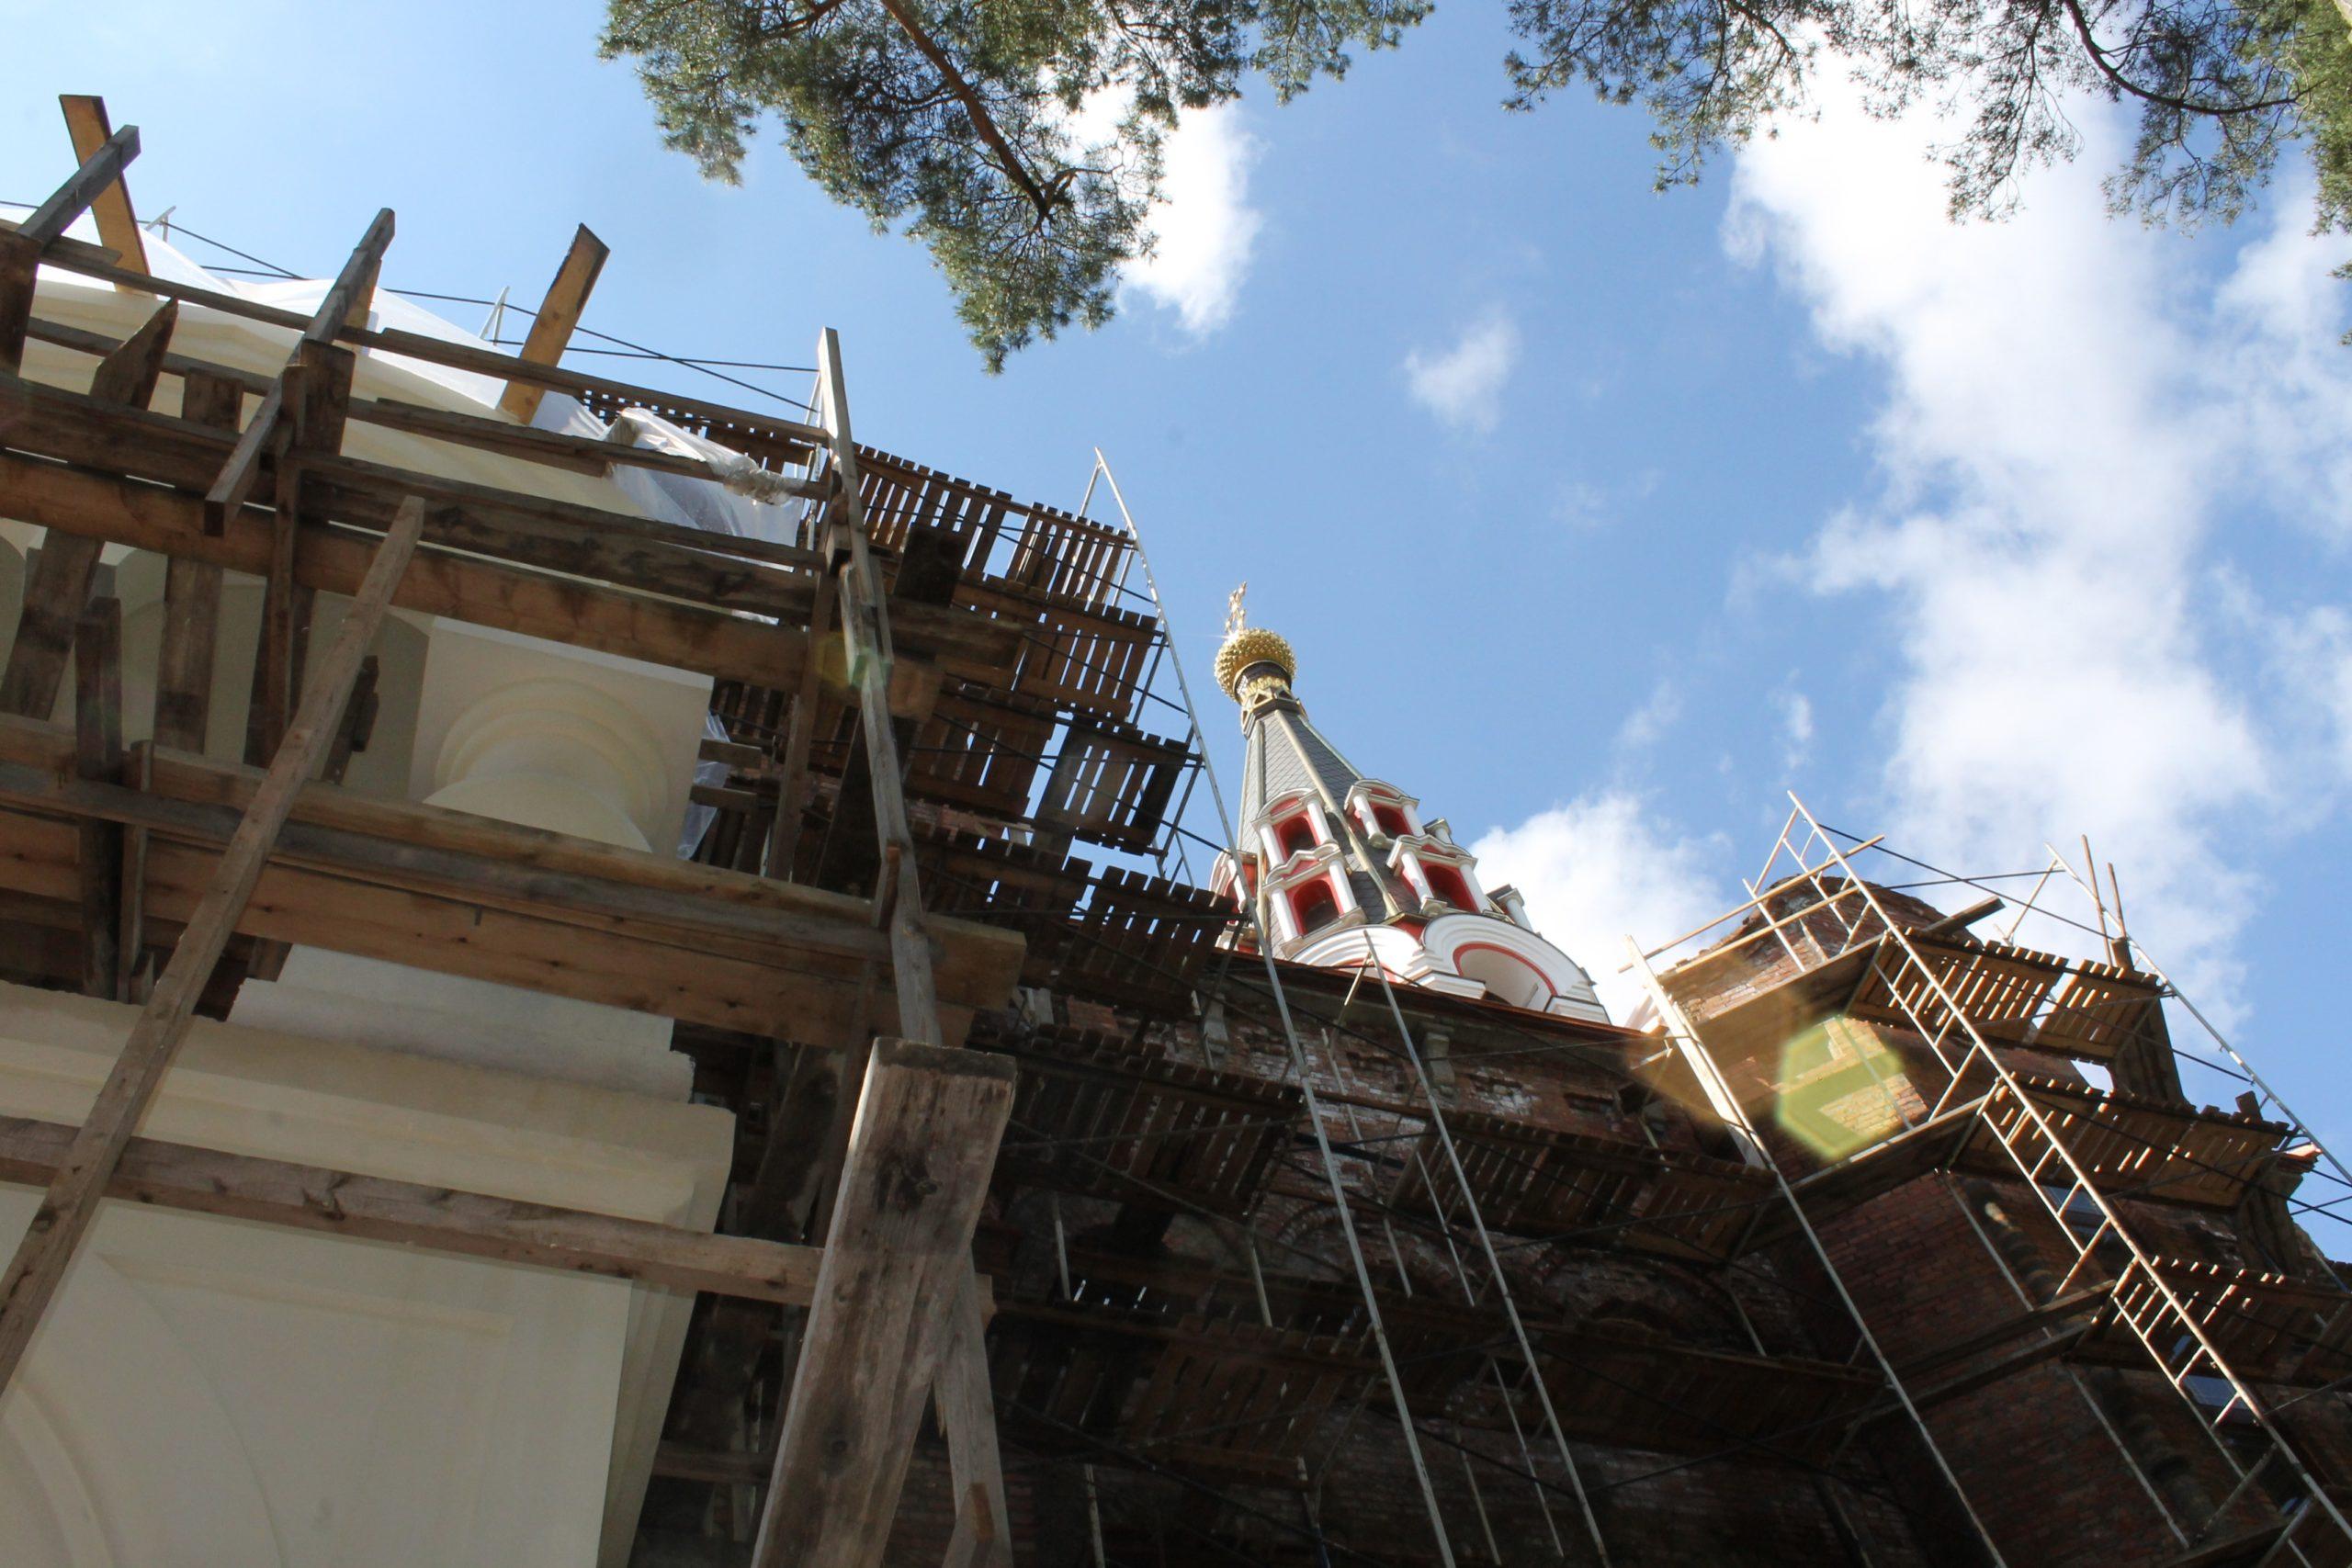 Освящен нижний предел храма Святого Великомученика Пантелеимона